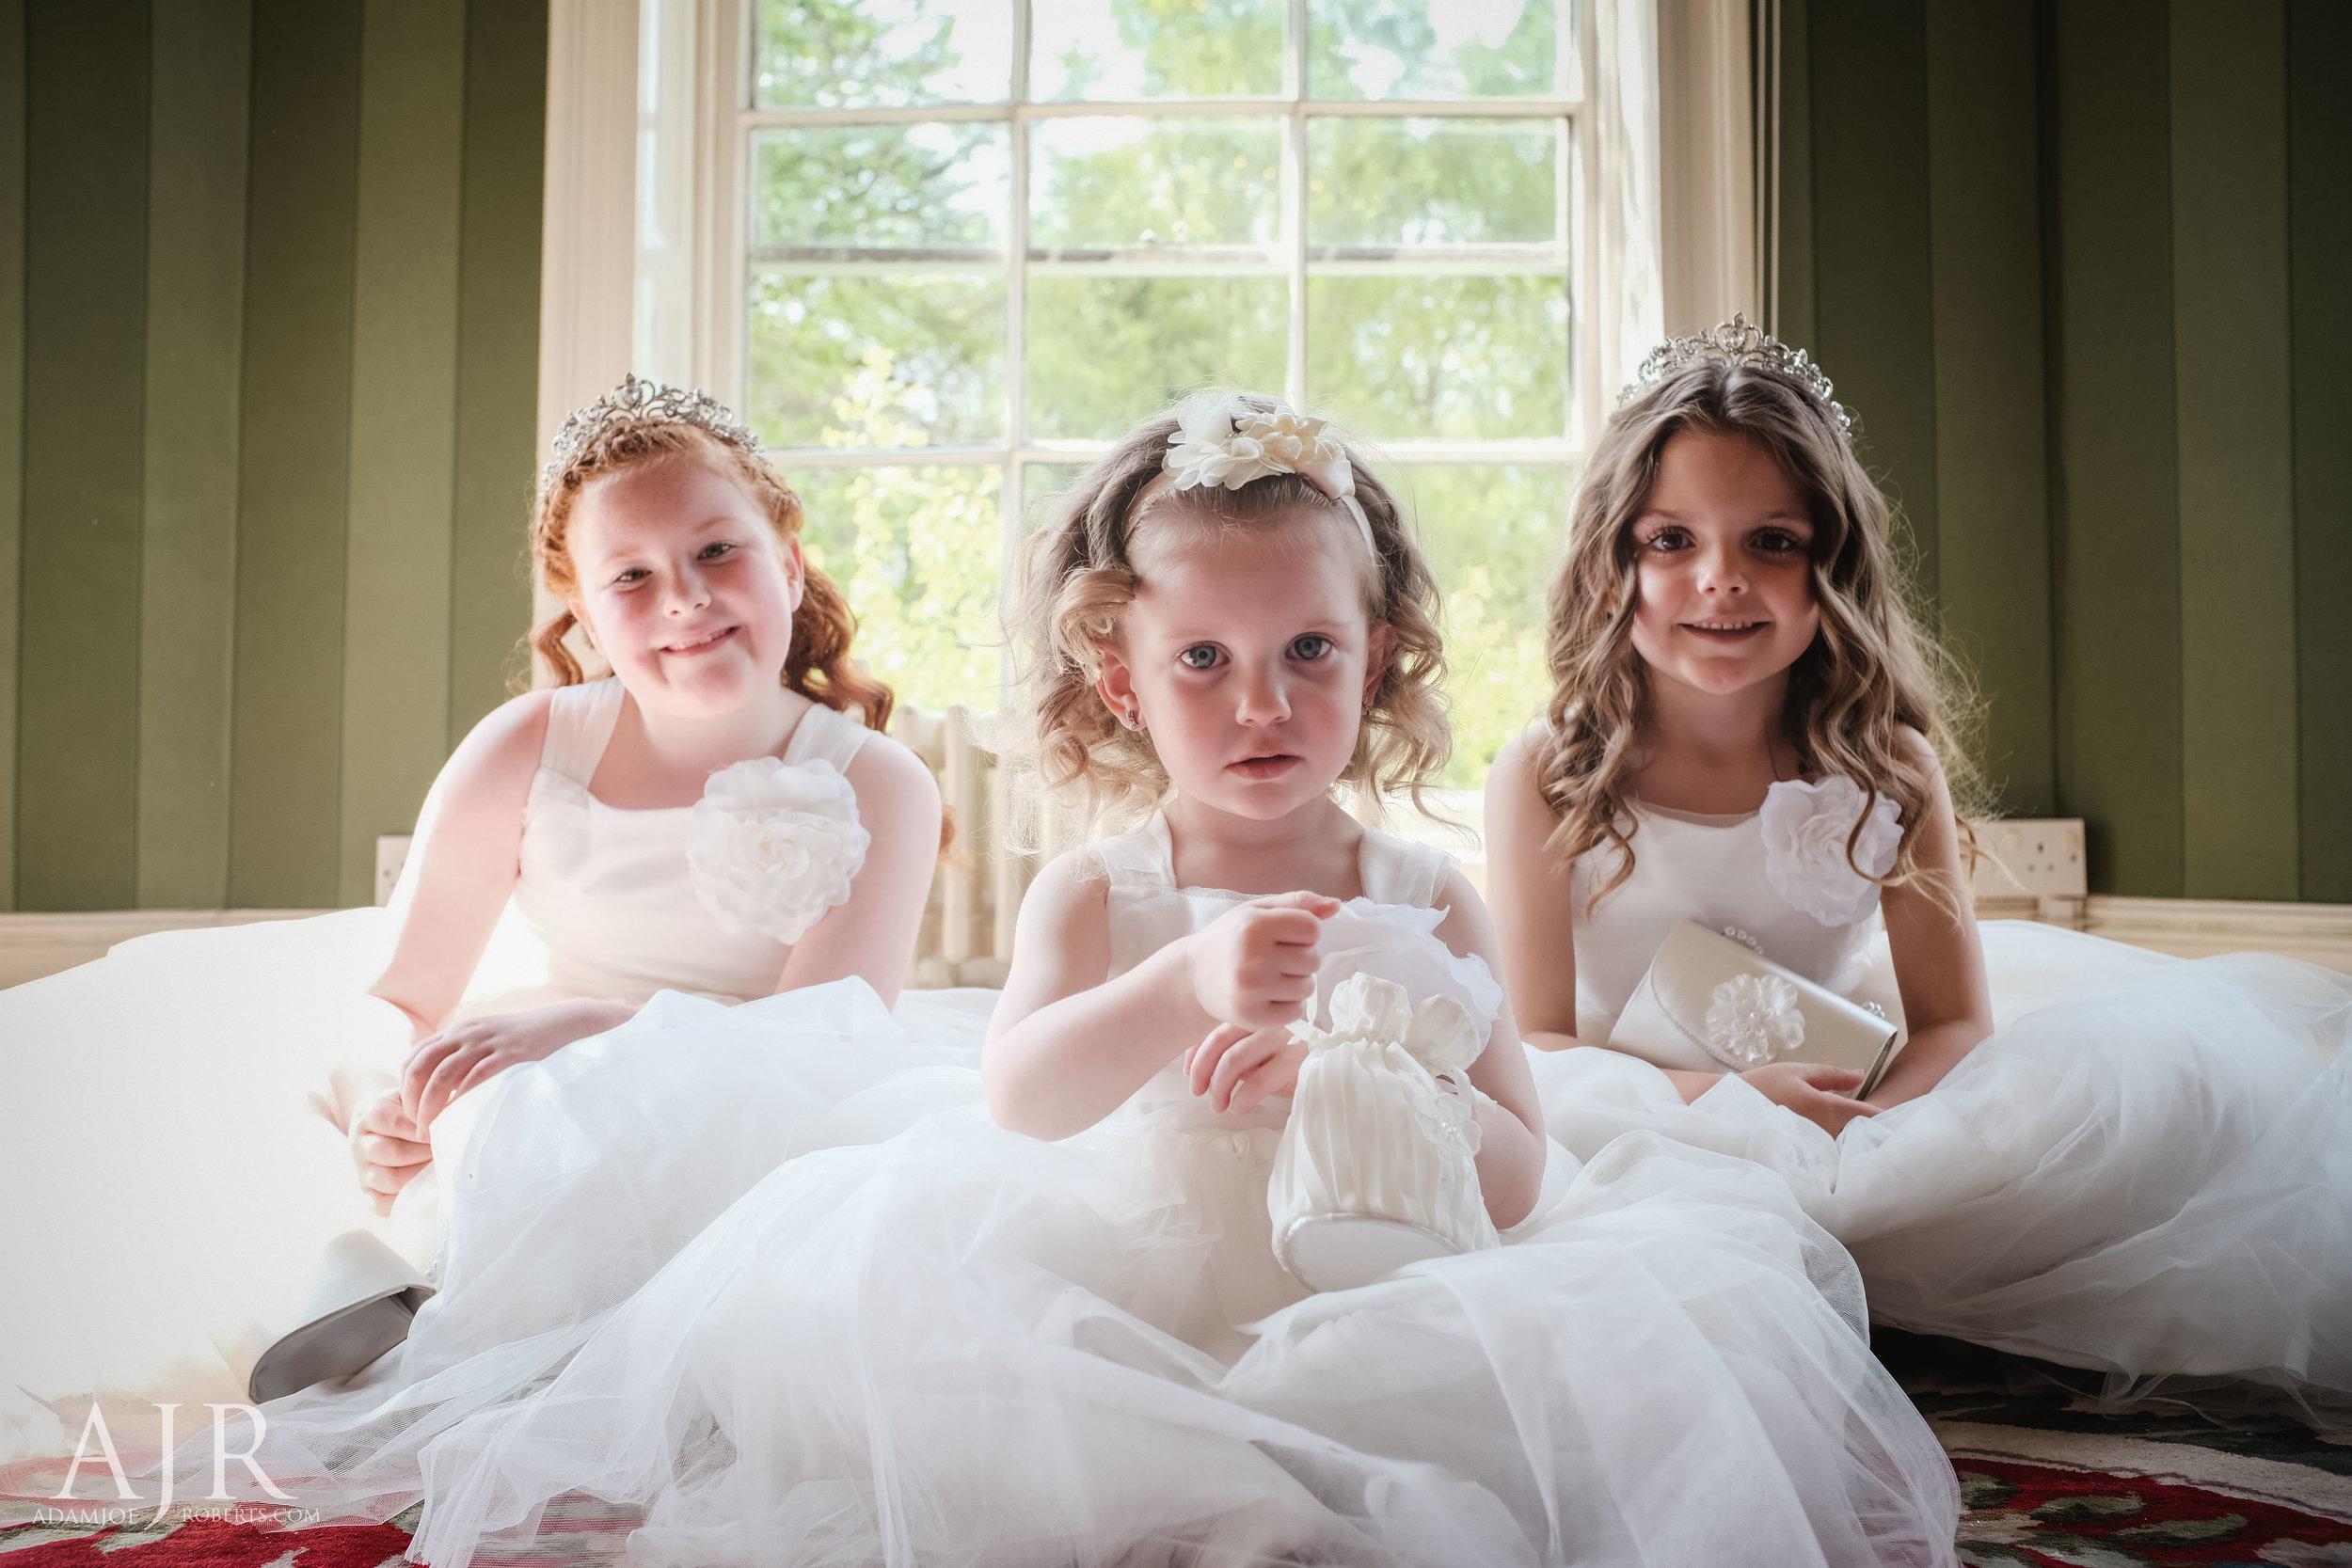 statham lodge wedding photographer cheshire wedding photographer (3 of 11).jpg